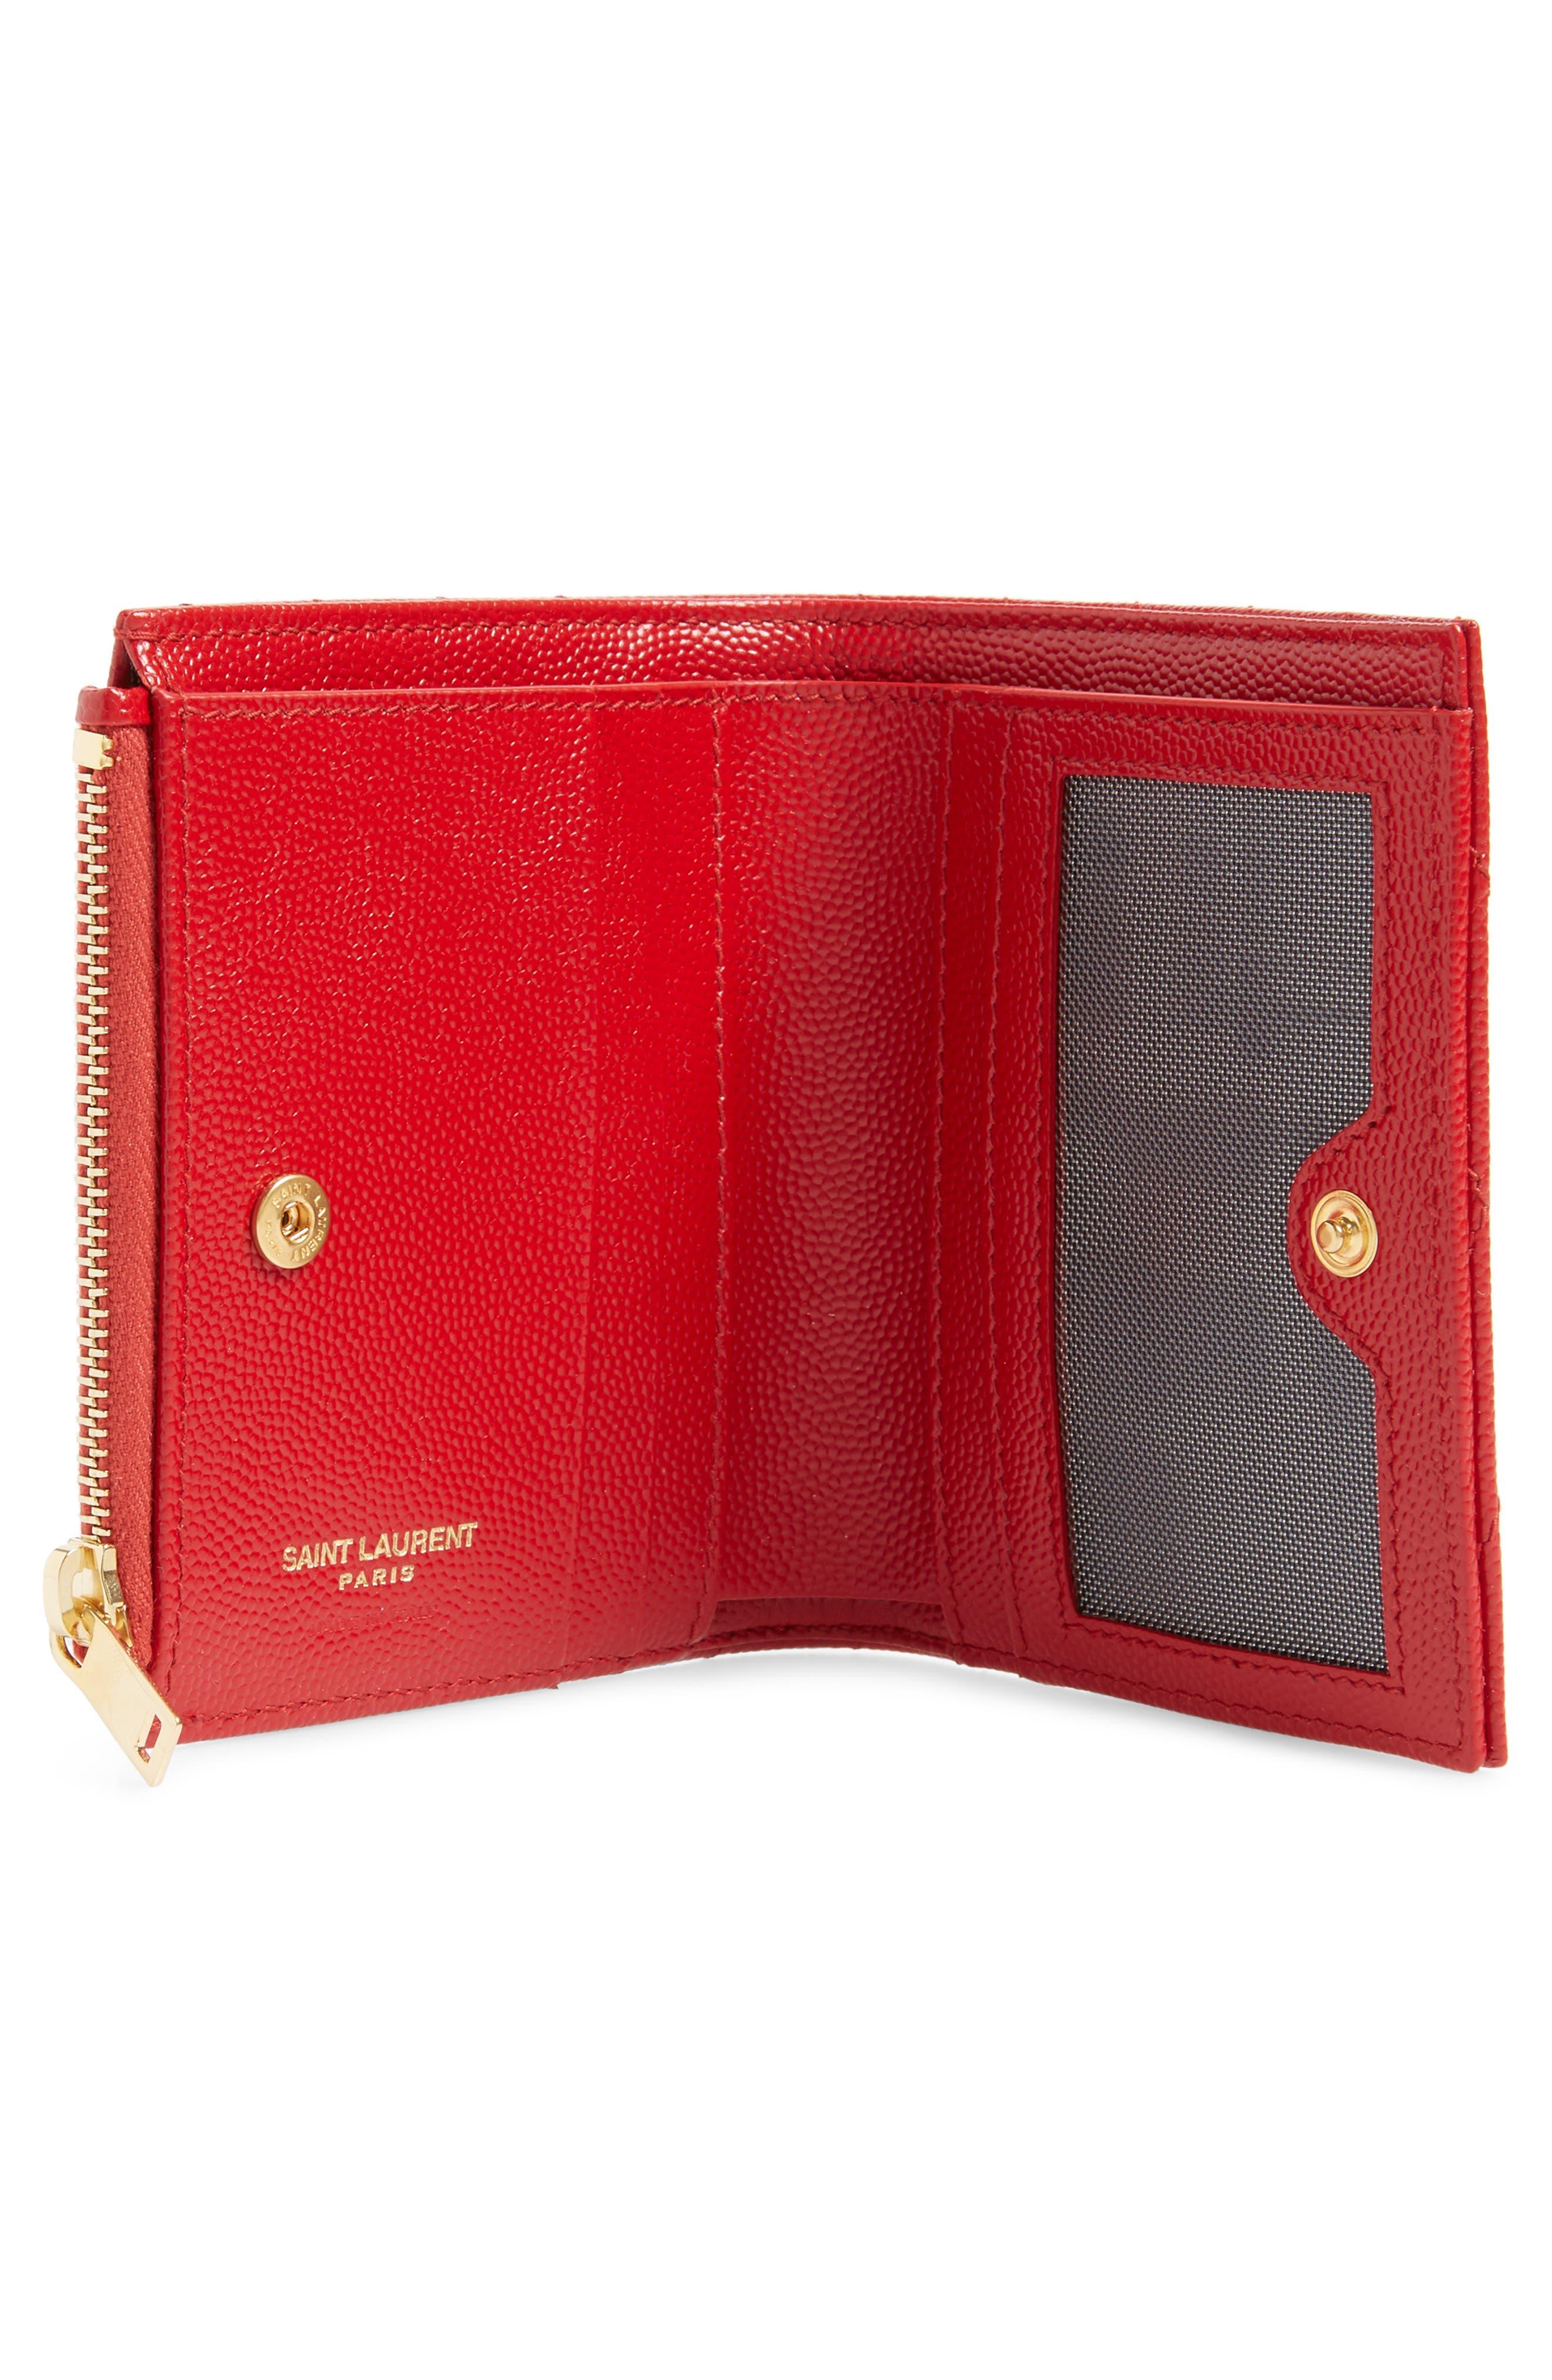 SAINT LAURENT, Monogram Leather Card Case, Alternate thumbnail 2, color, BANDANA RED